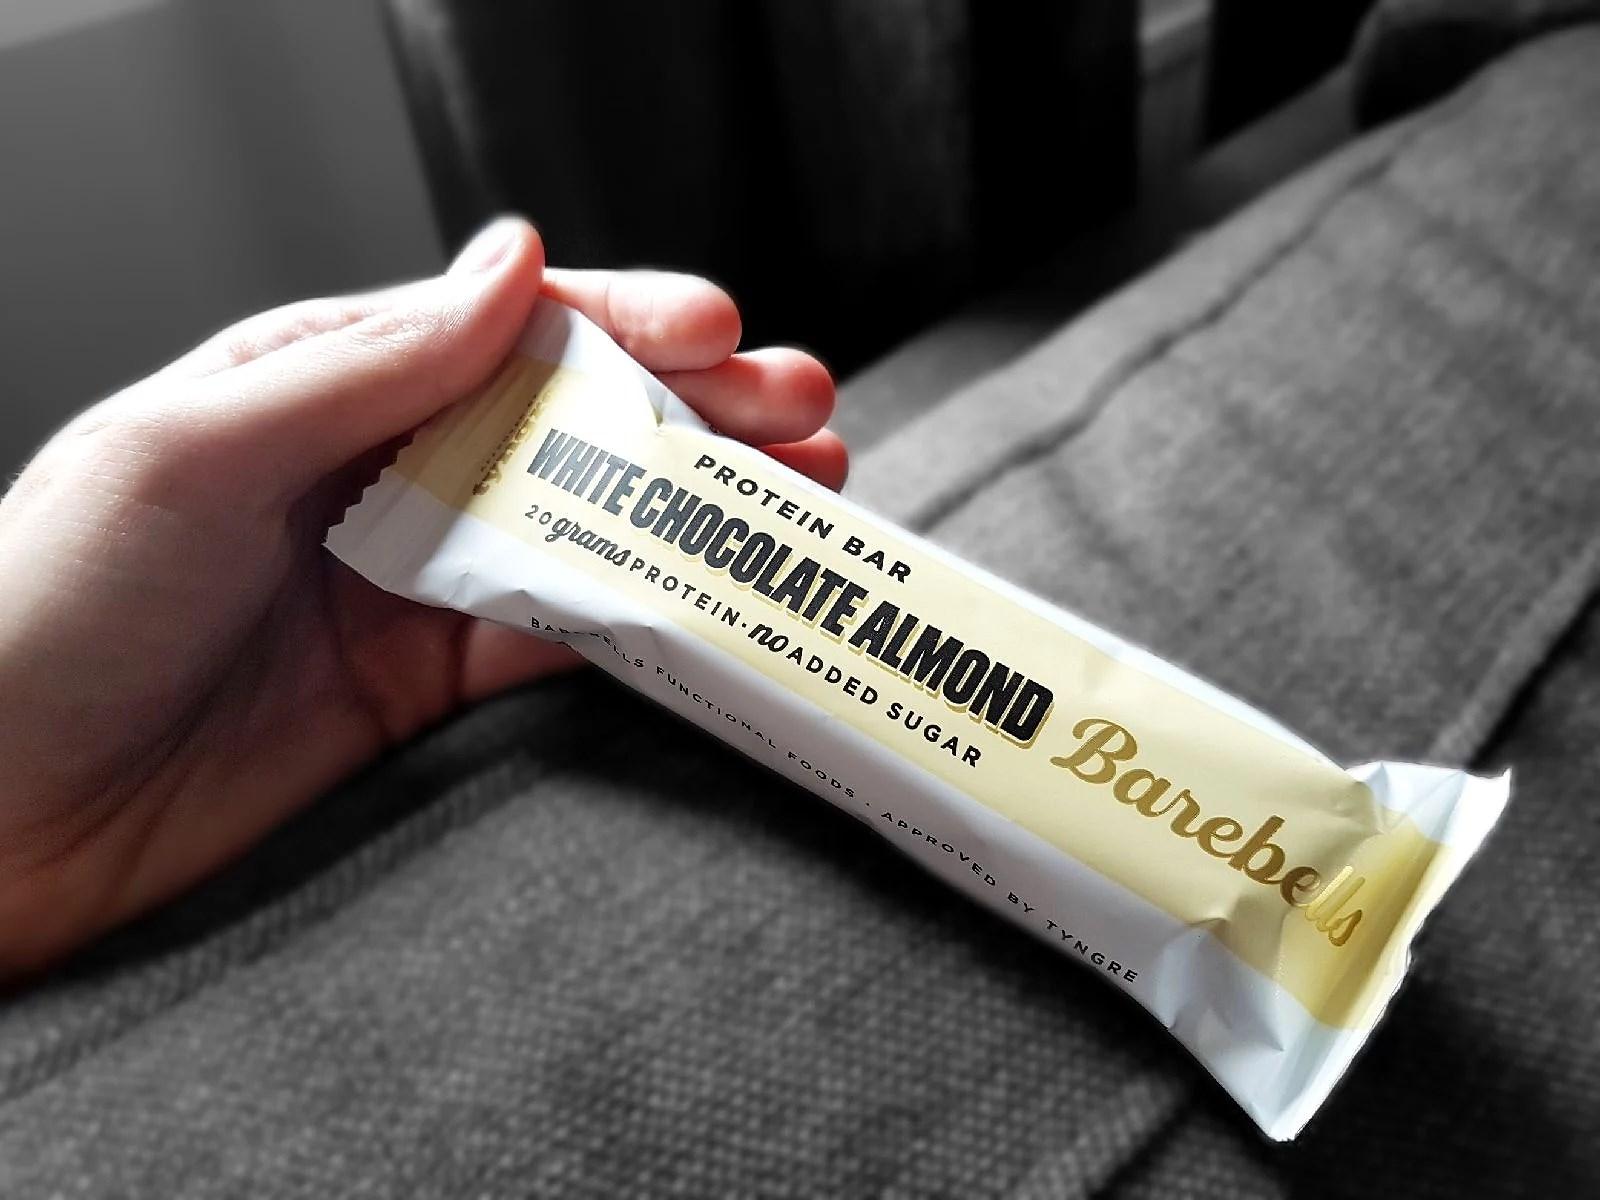 White chocolate Almond